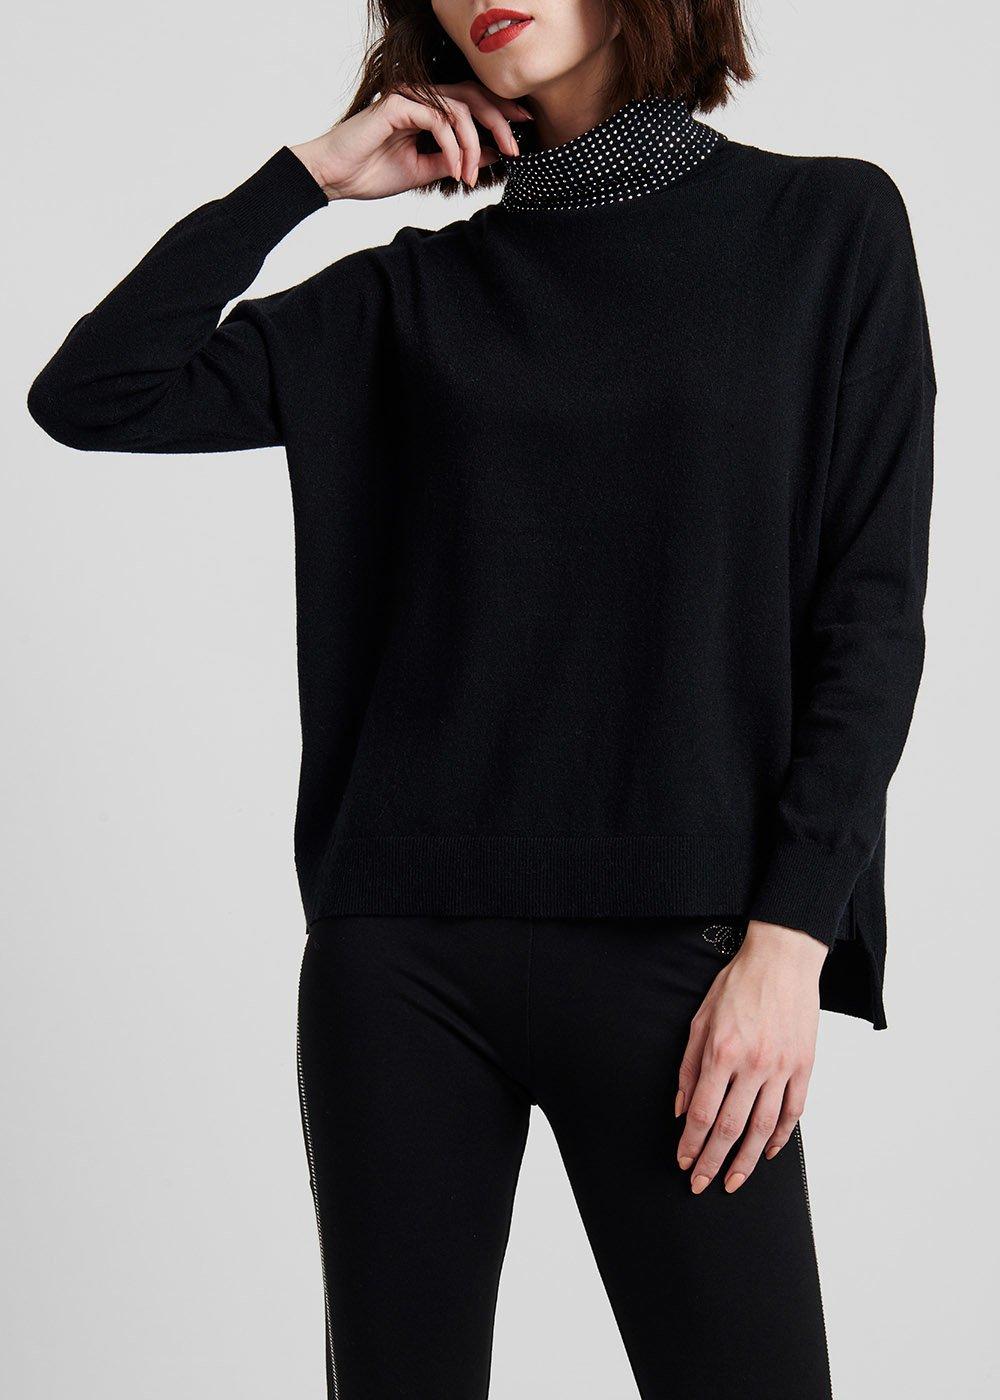 High-neck viscose sweater with rhinestones - Black - Woman